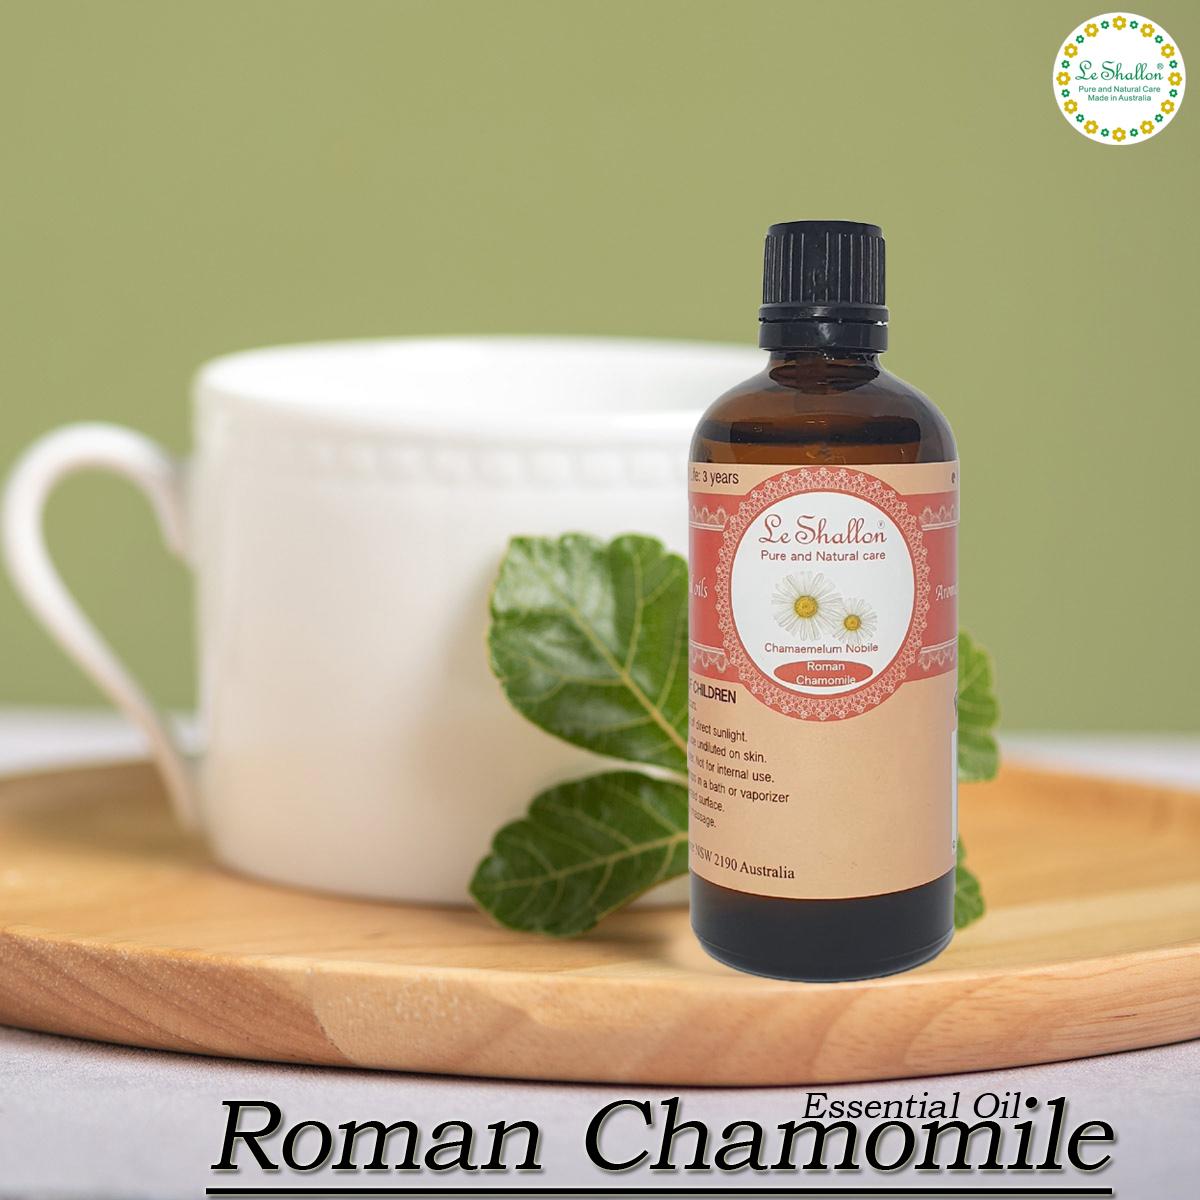 Organic Chamomile Essential Oil - German (Blue) Matricaria